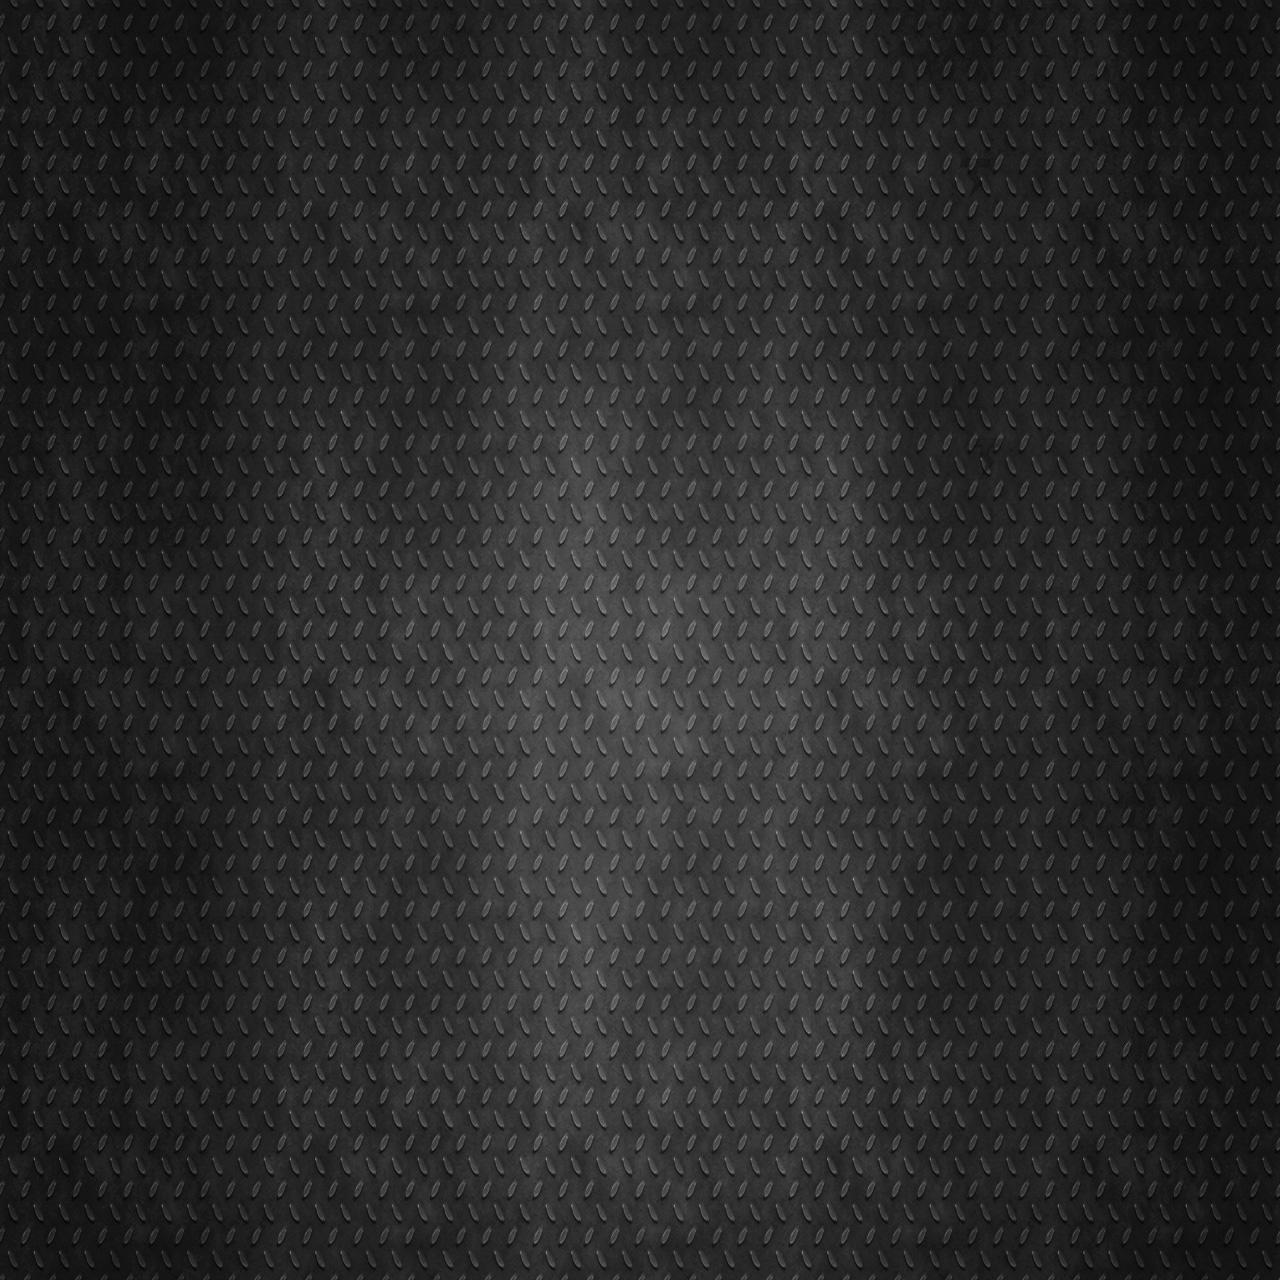 4k Black Wallpaper For Android Apk Download